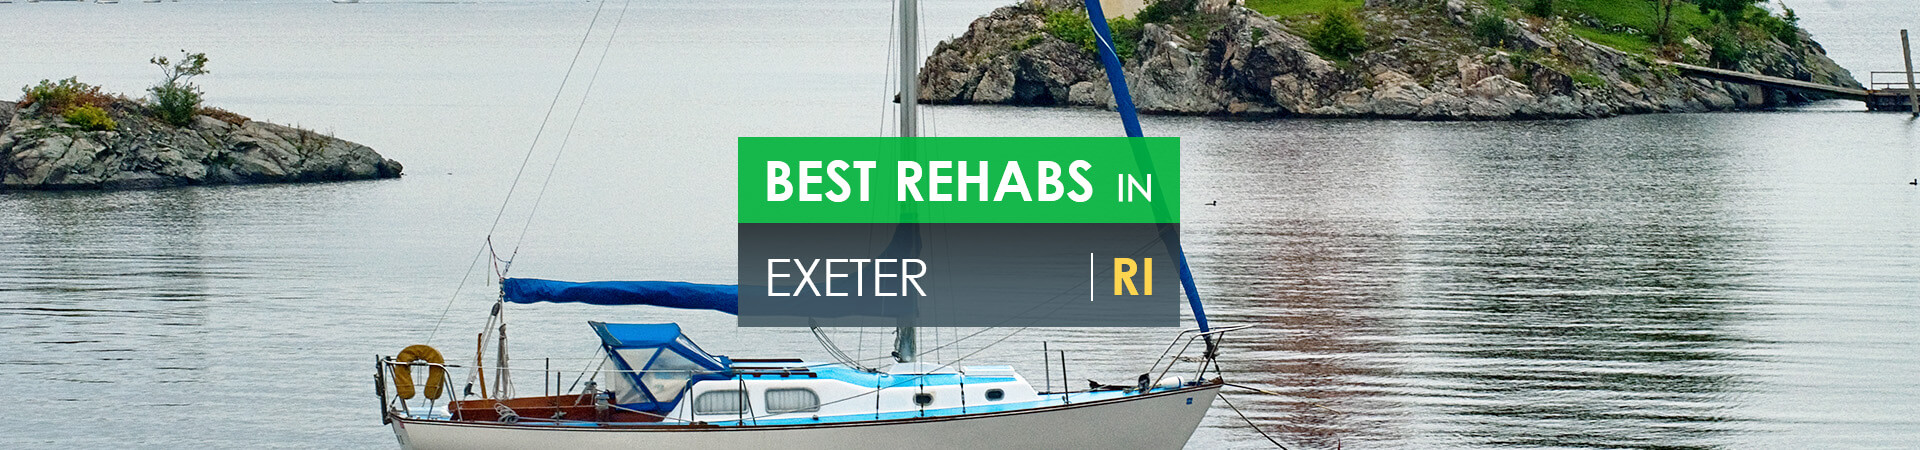 Best rehabs in Exeter, RI